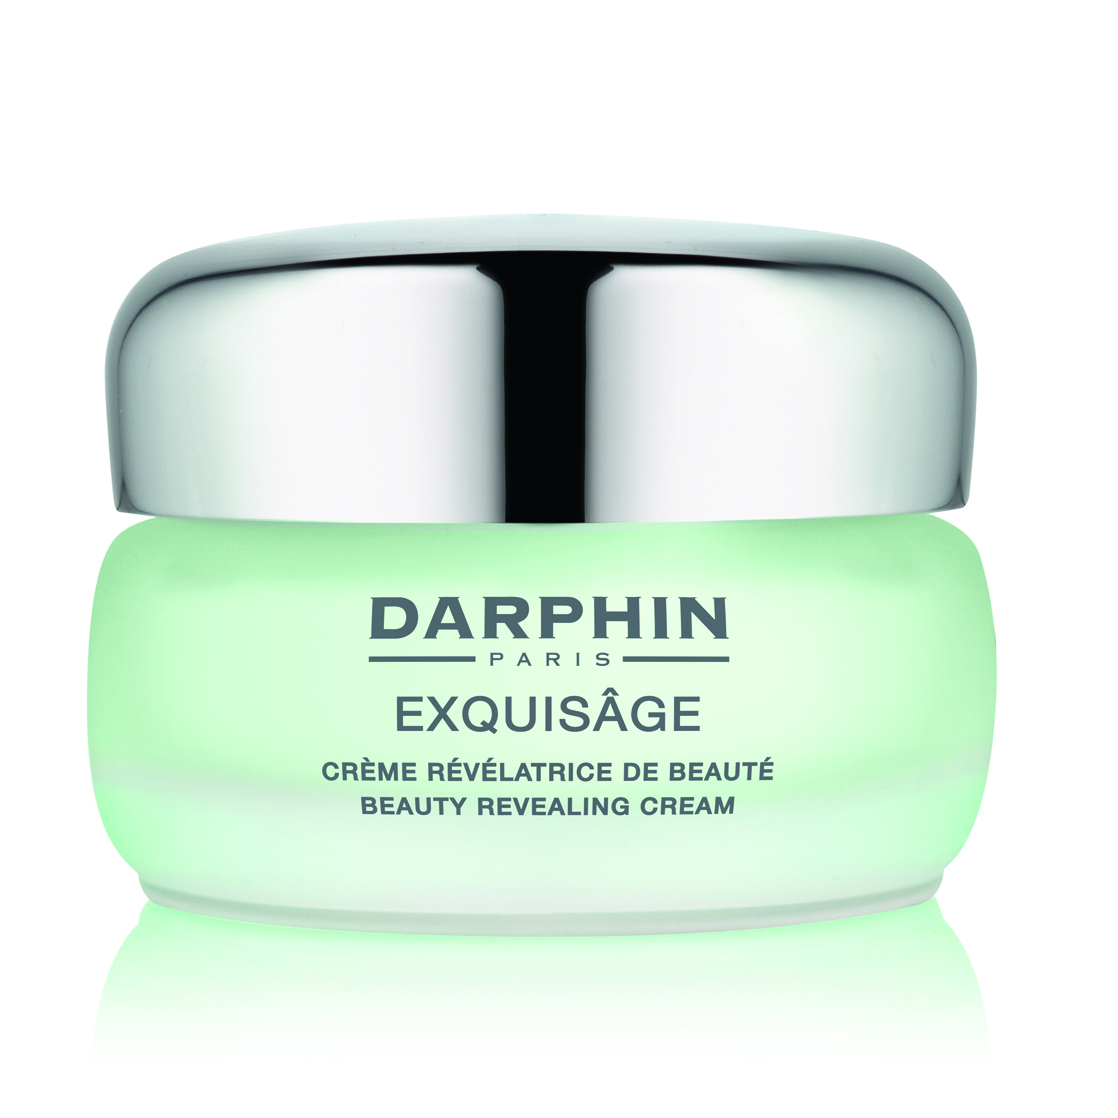 Darphin Exquisage Revelateur Cream Αντιγηραντική Συσφικτικη Κρέμα Προσώπου για Όλους τους Τύπους Δέρματος 50ml